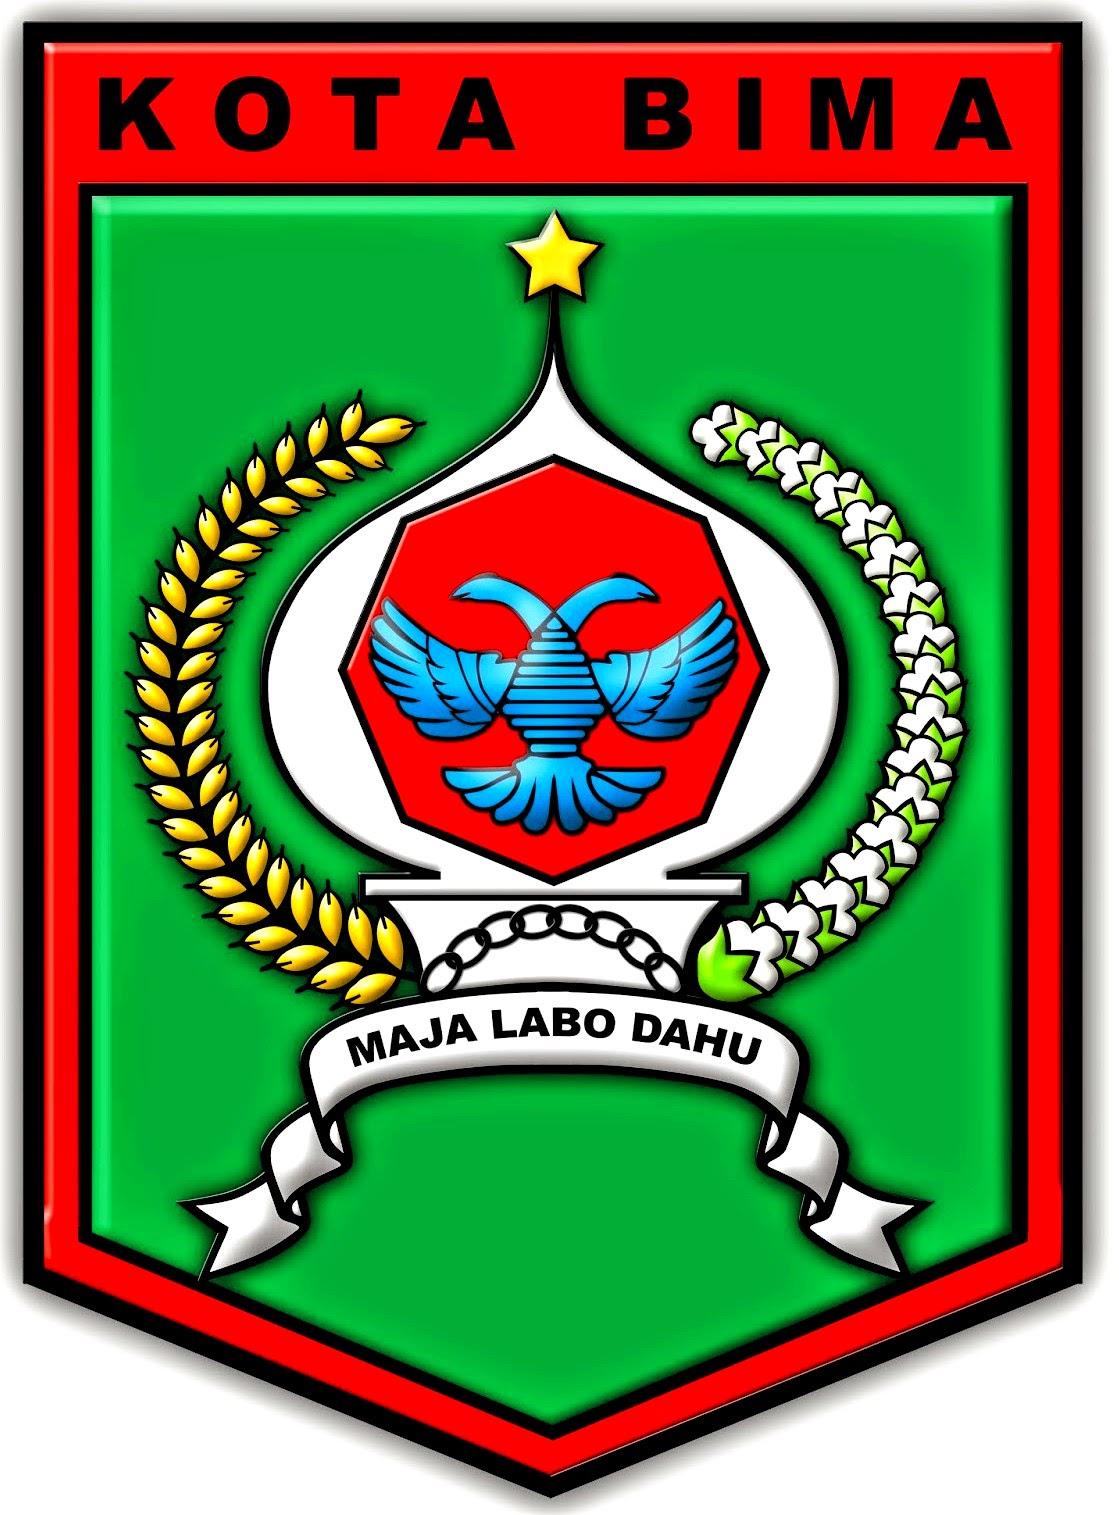 Pengumuman CPNS Kota Bima - NTB - Nusa Tenggara Barat